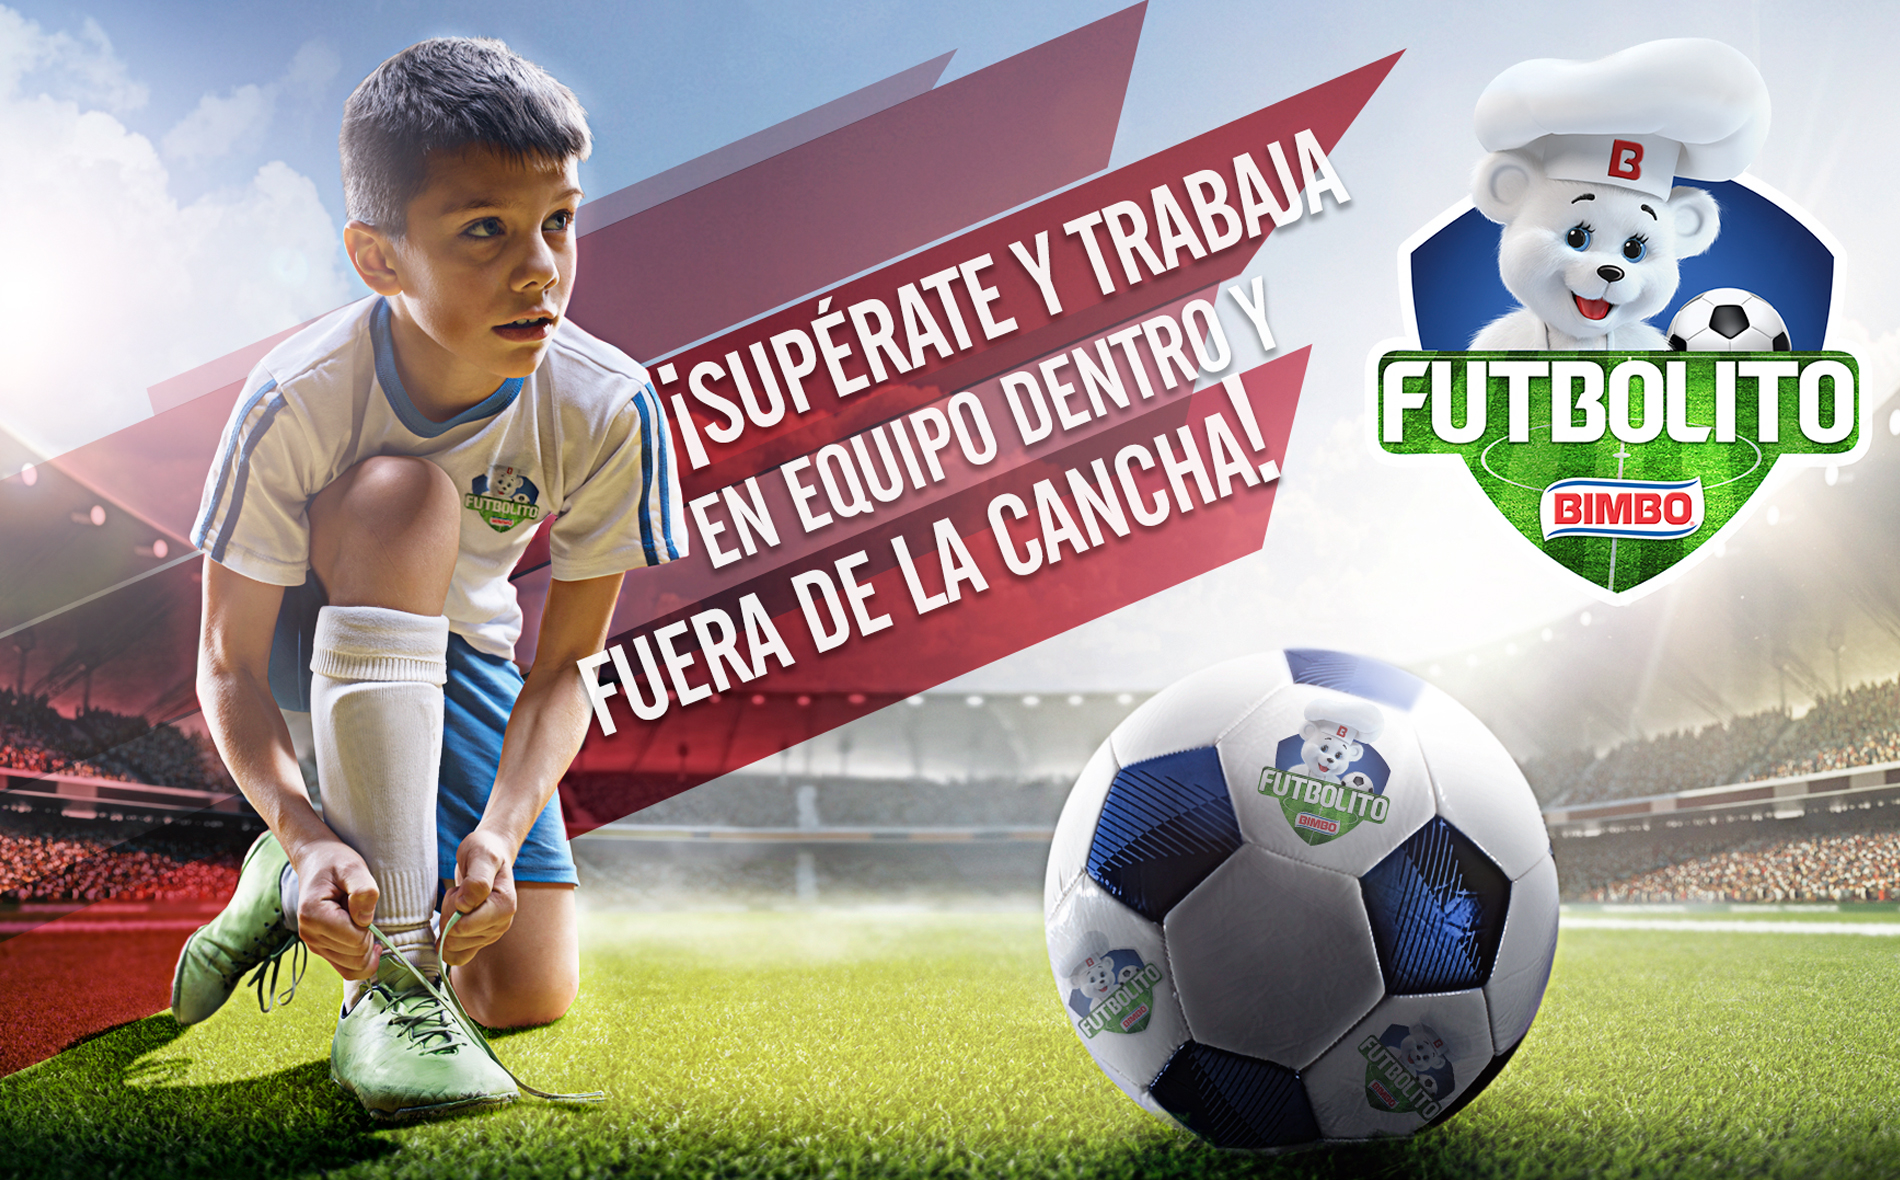 Bimbo® B-Active Soccer Tournament, un campeonato de fútbol de Bimbo® para niños y niñas